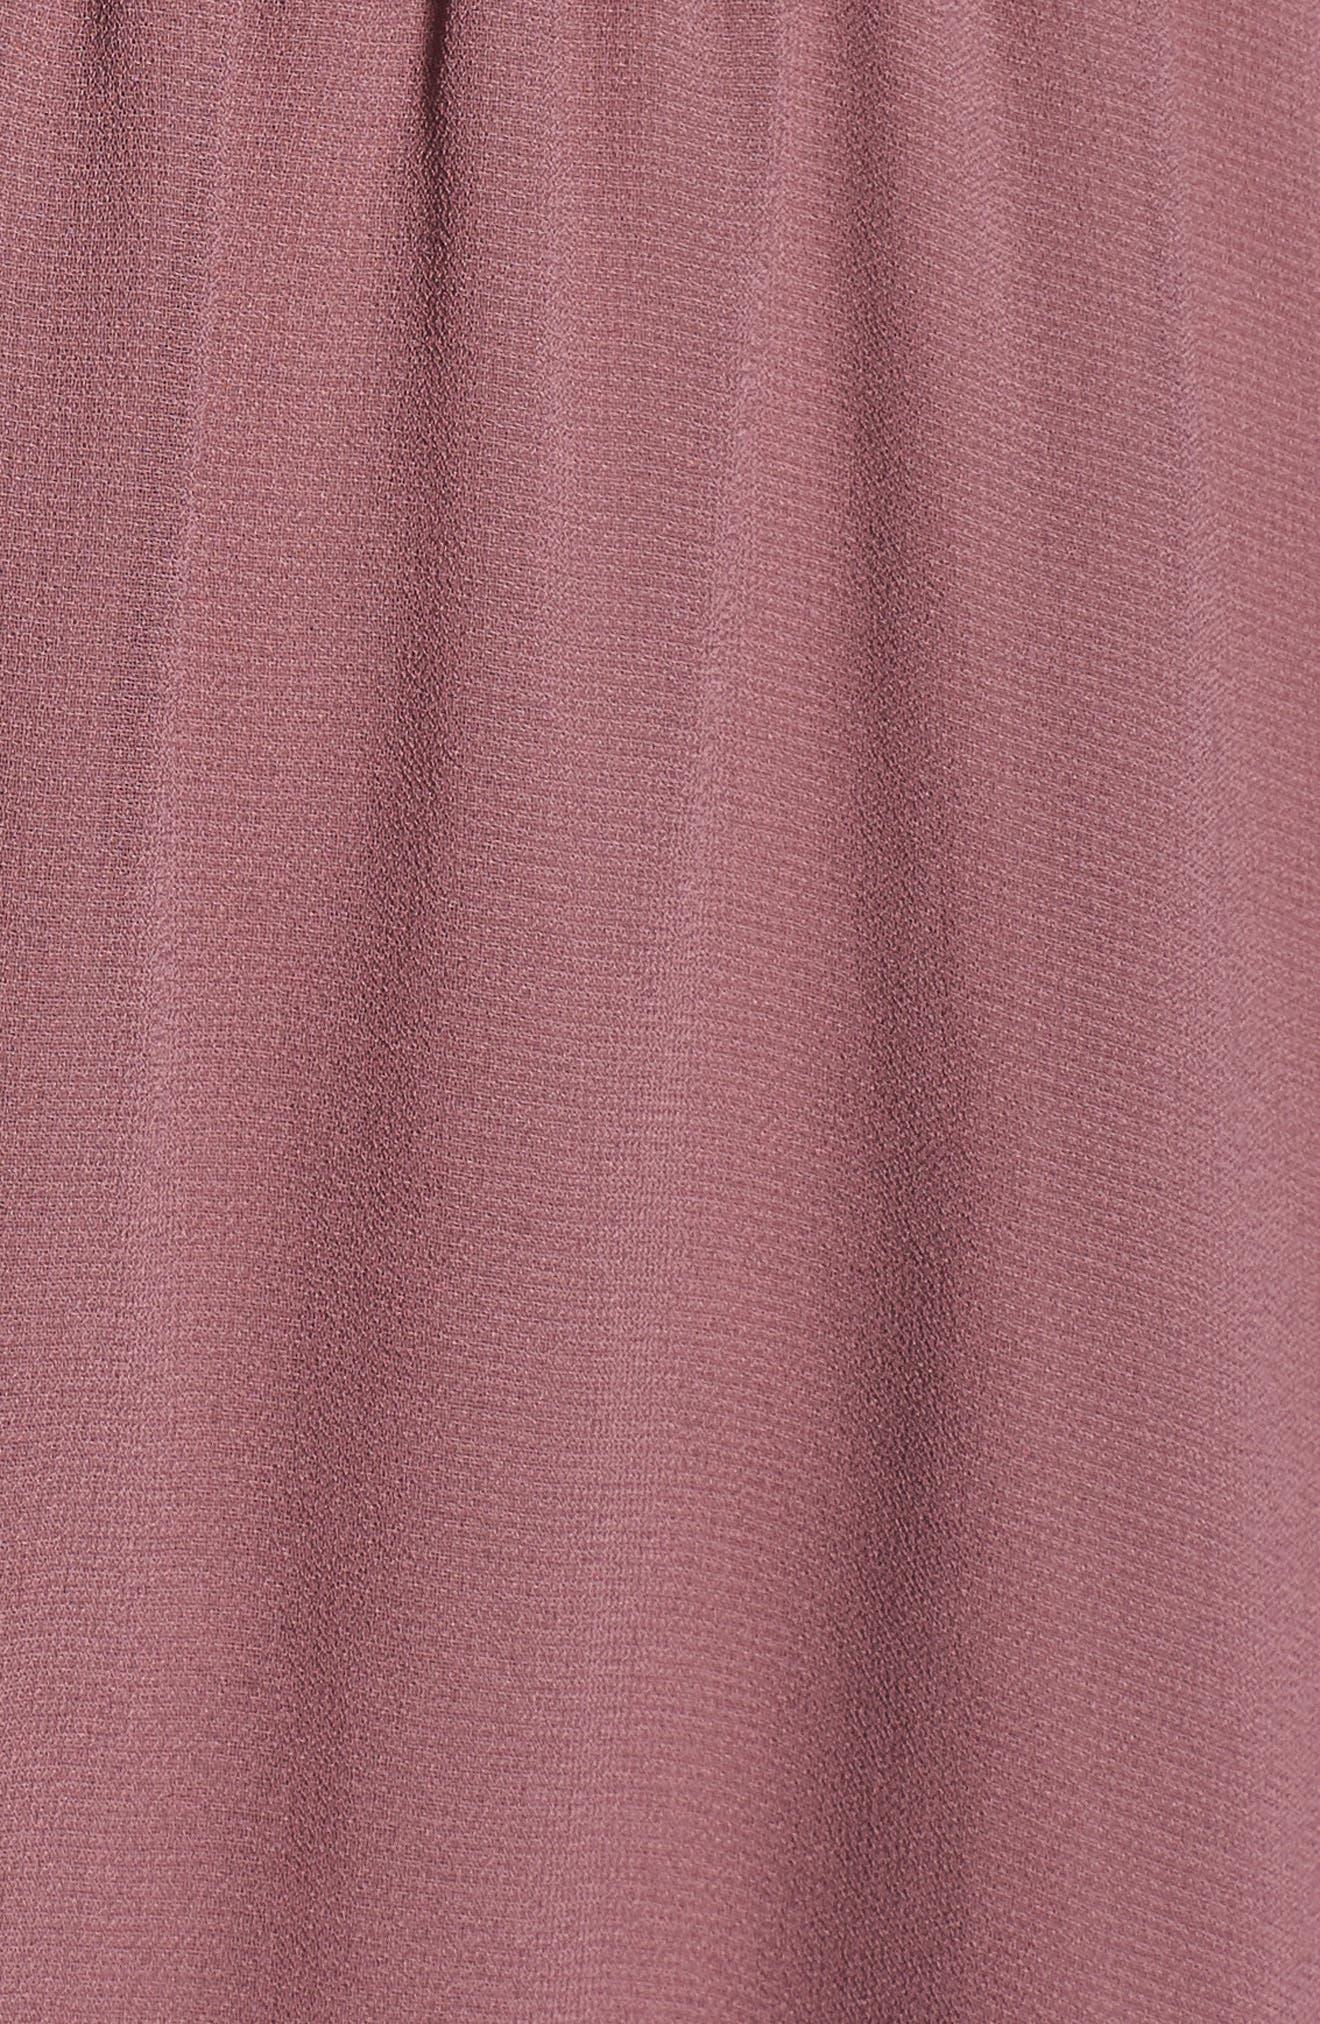 Blouson Chiffon Skater Dress,                             Alternate thumbnail 238, color,